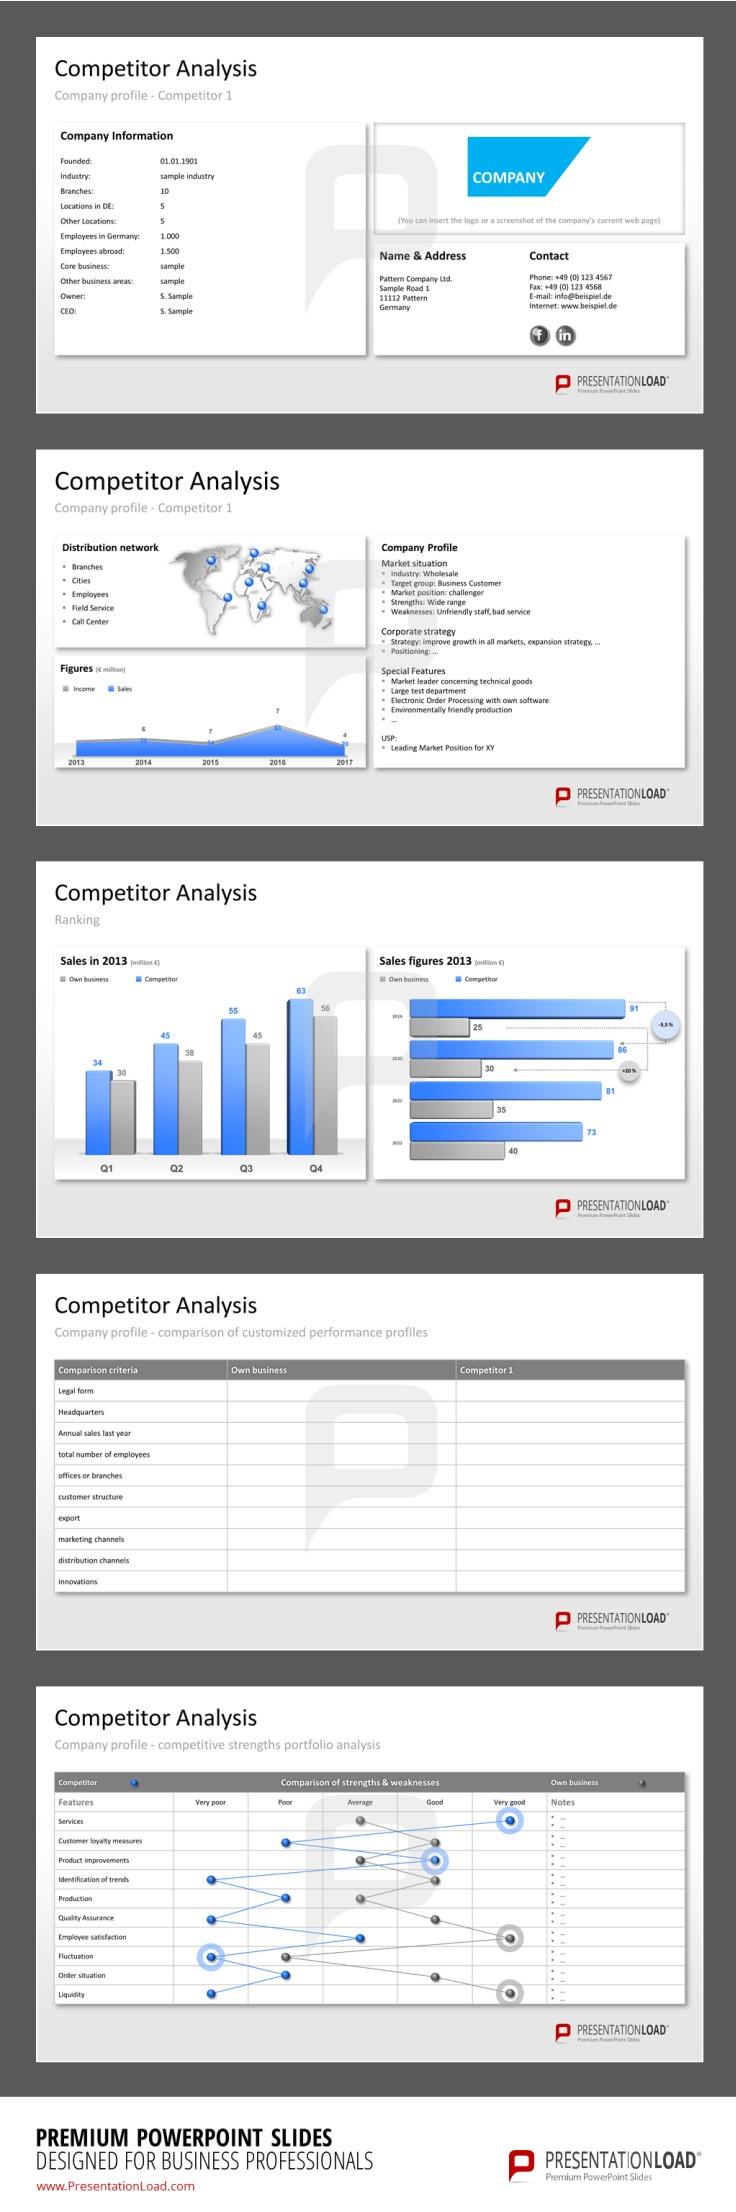 Competitor Analysis Presentationload Competitor Analysis Business Planning Business Plan Template